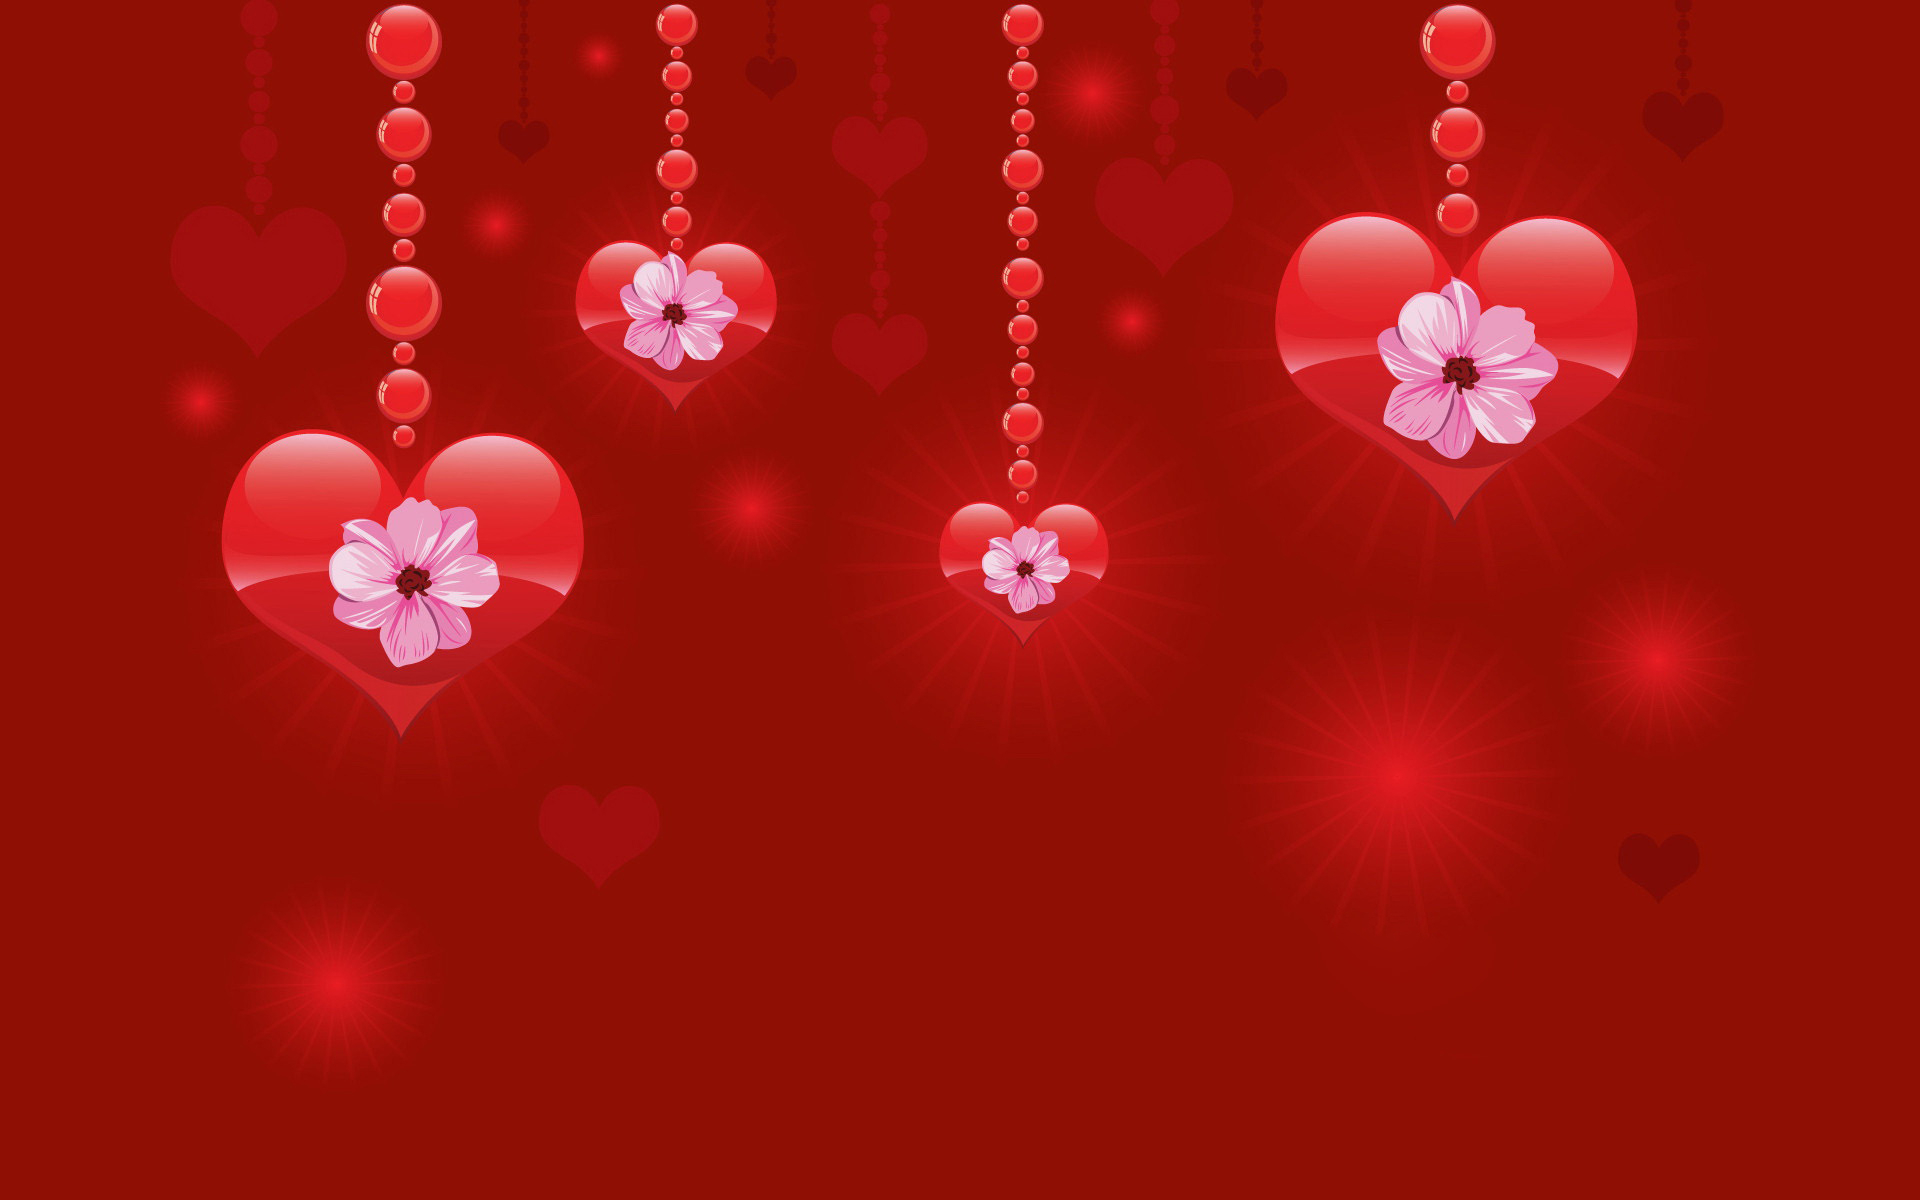 Valentines Day Wallpapers - WallpaperSafari